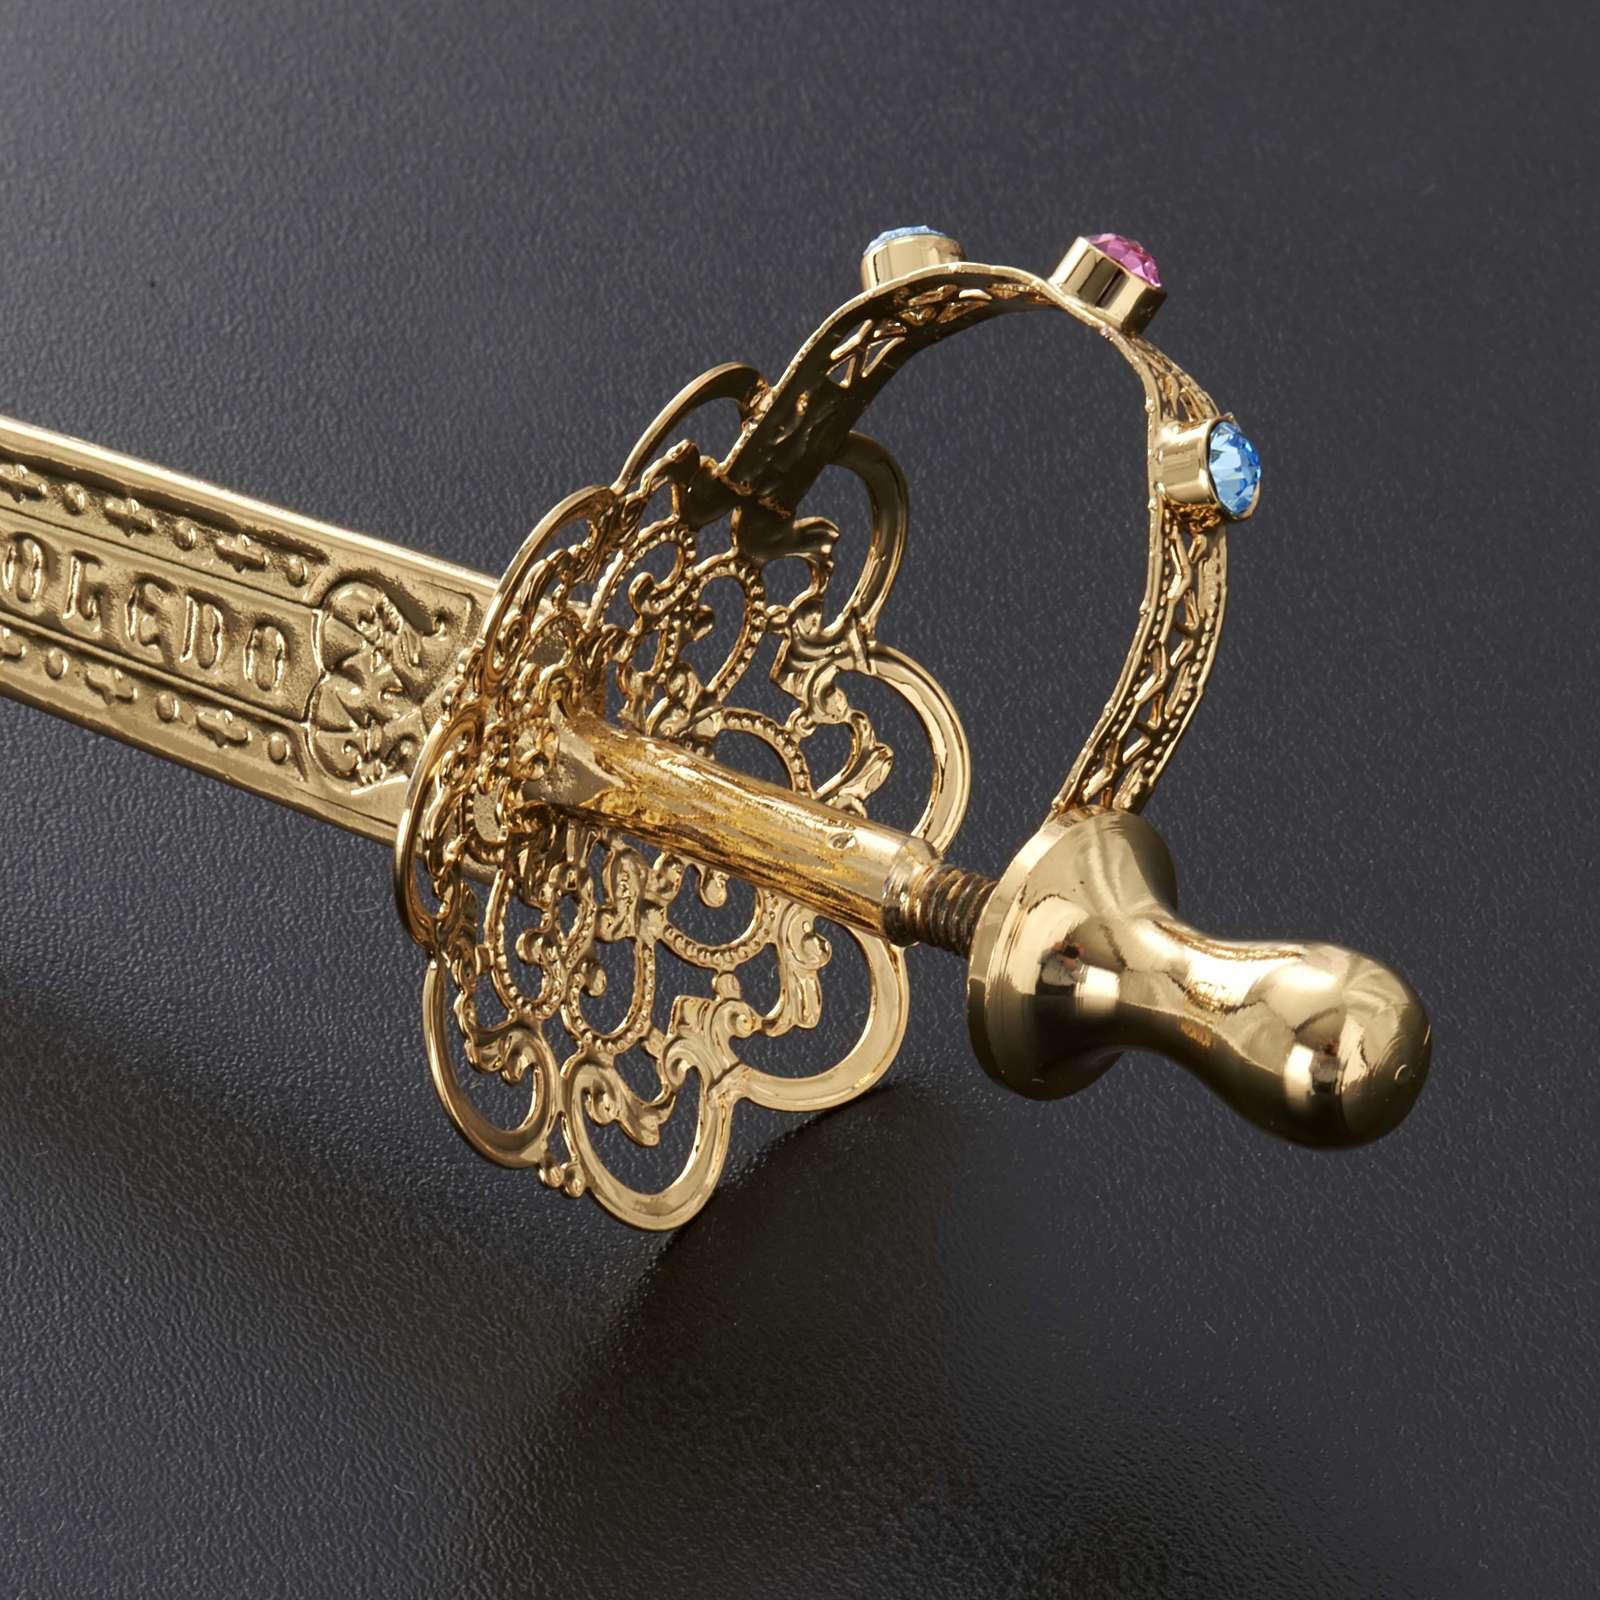 Espada latón filigrana dorada 3